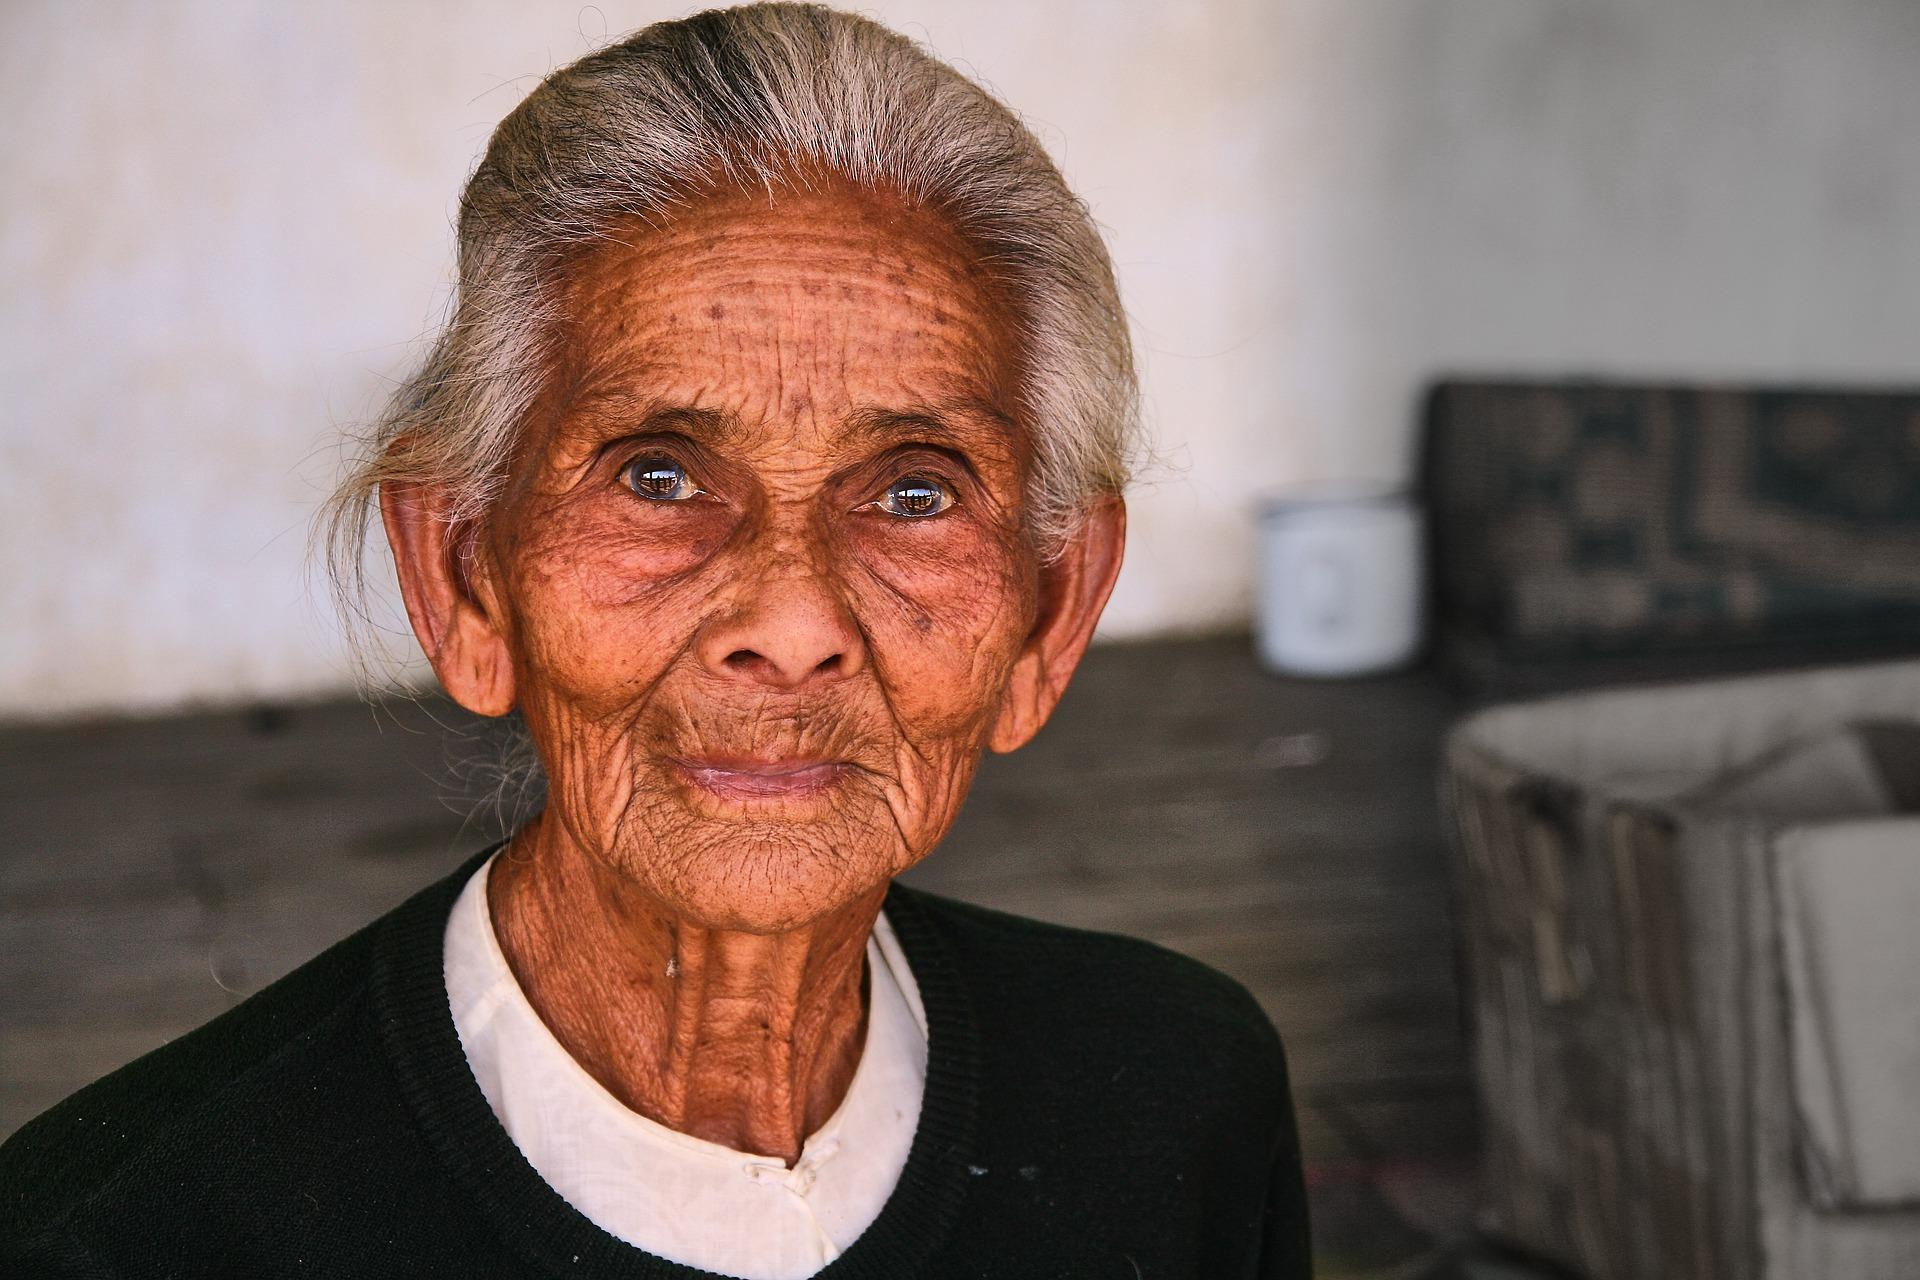 MYANMAR PRAYER REQUEST